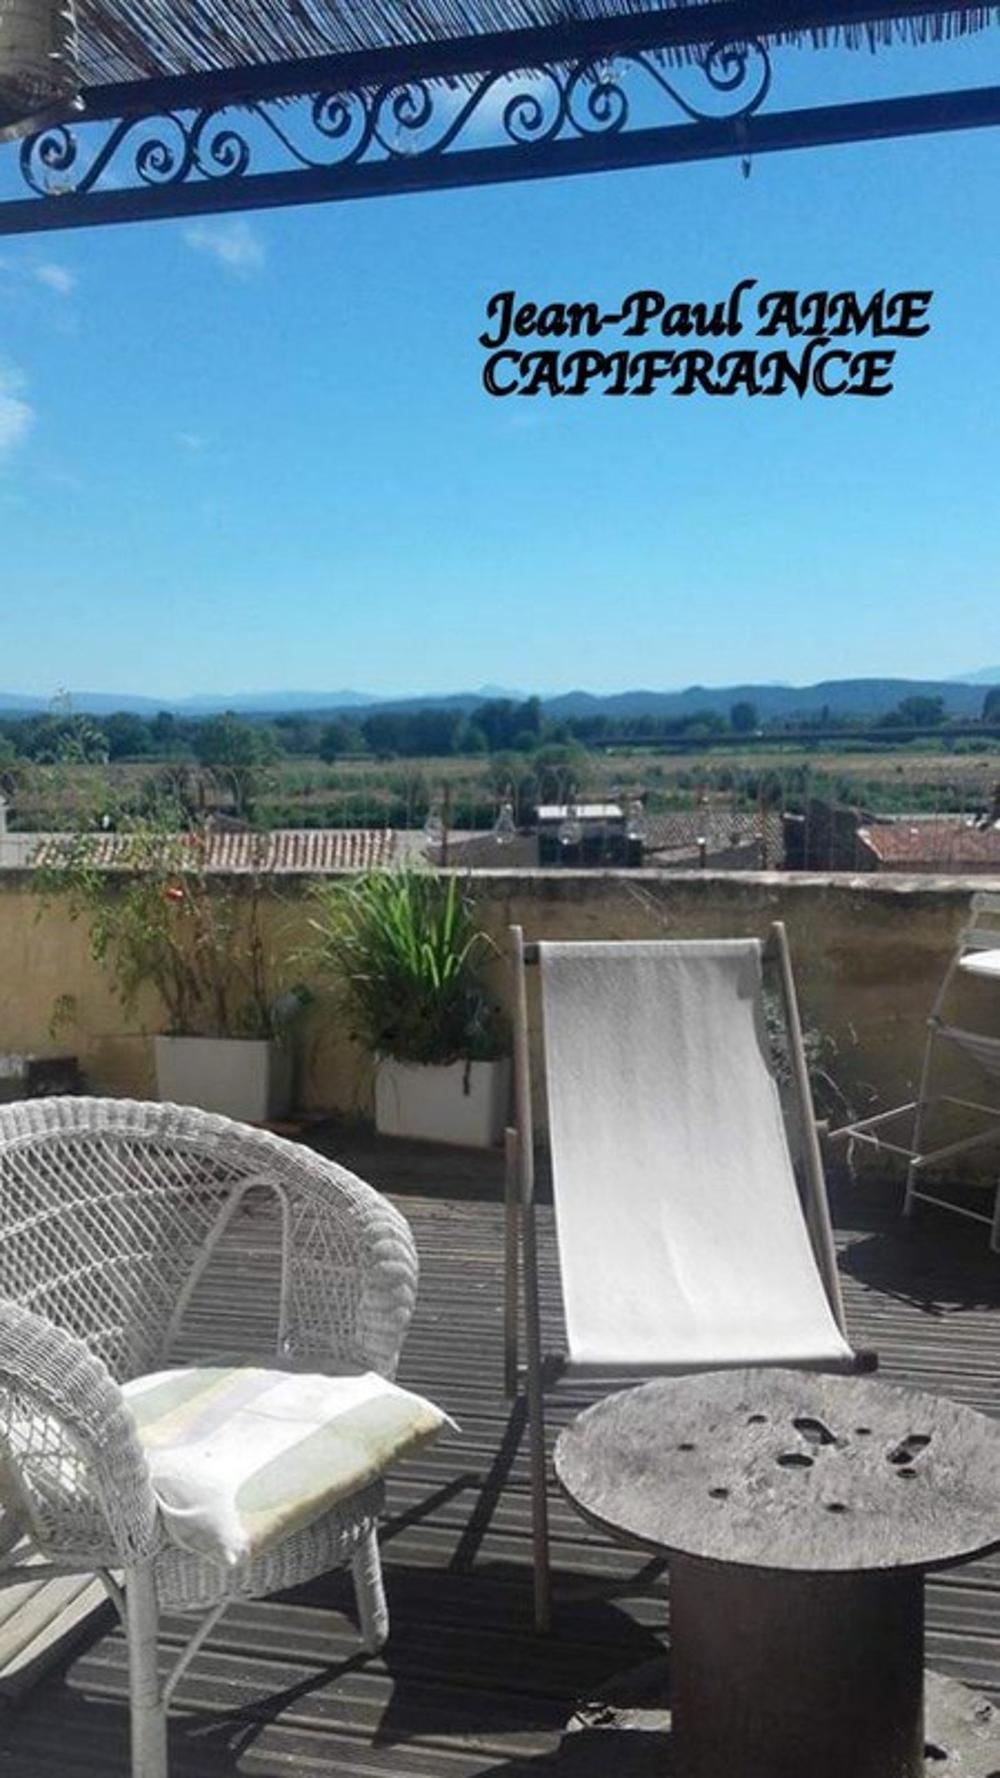 Pont-Saint-Esprit Gard Apartment Bild 3597268